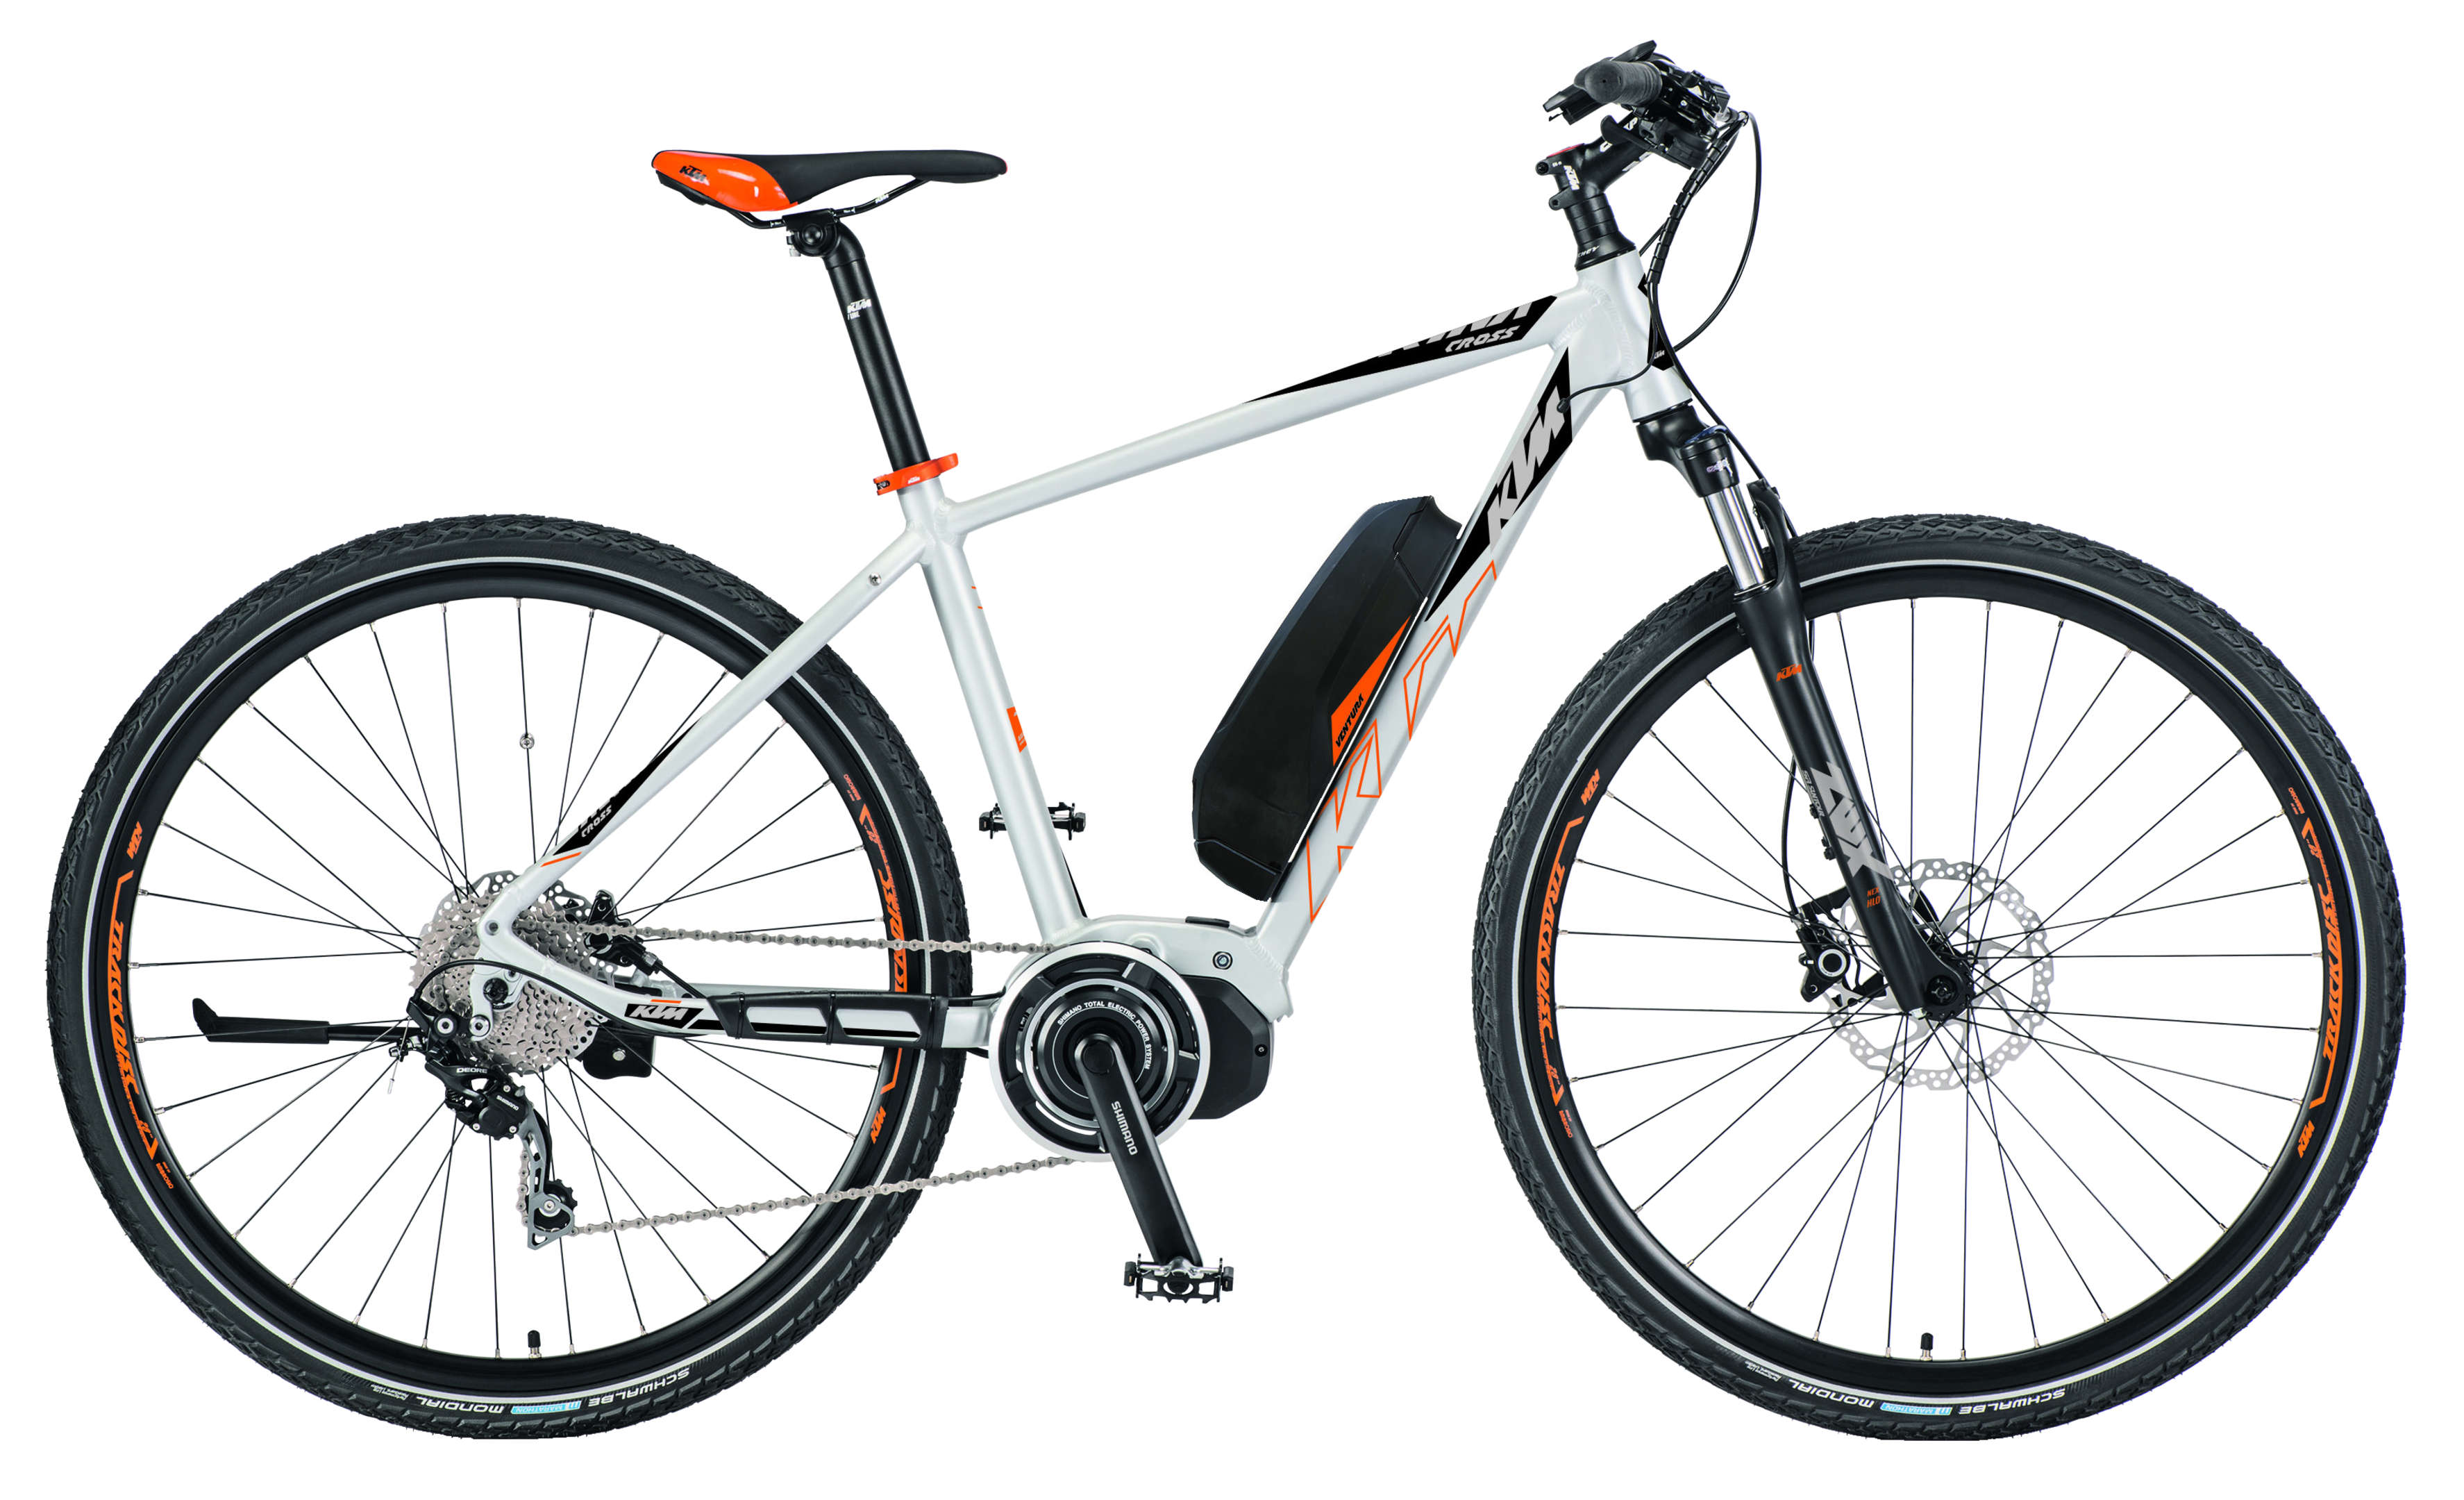 ktm e bike ventura cross 10 eurorad bikeleasingeurorad bikeleasing. Black Bedroom Furniture Sets. Home Design Ideas